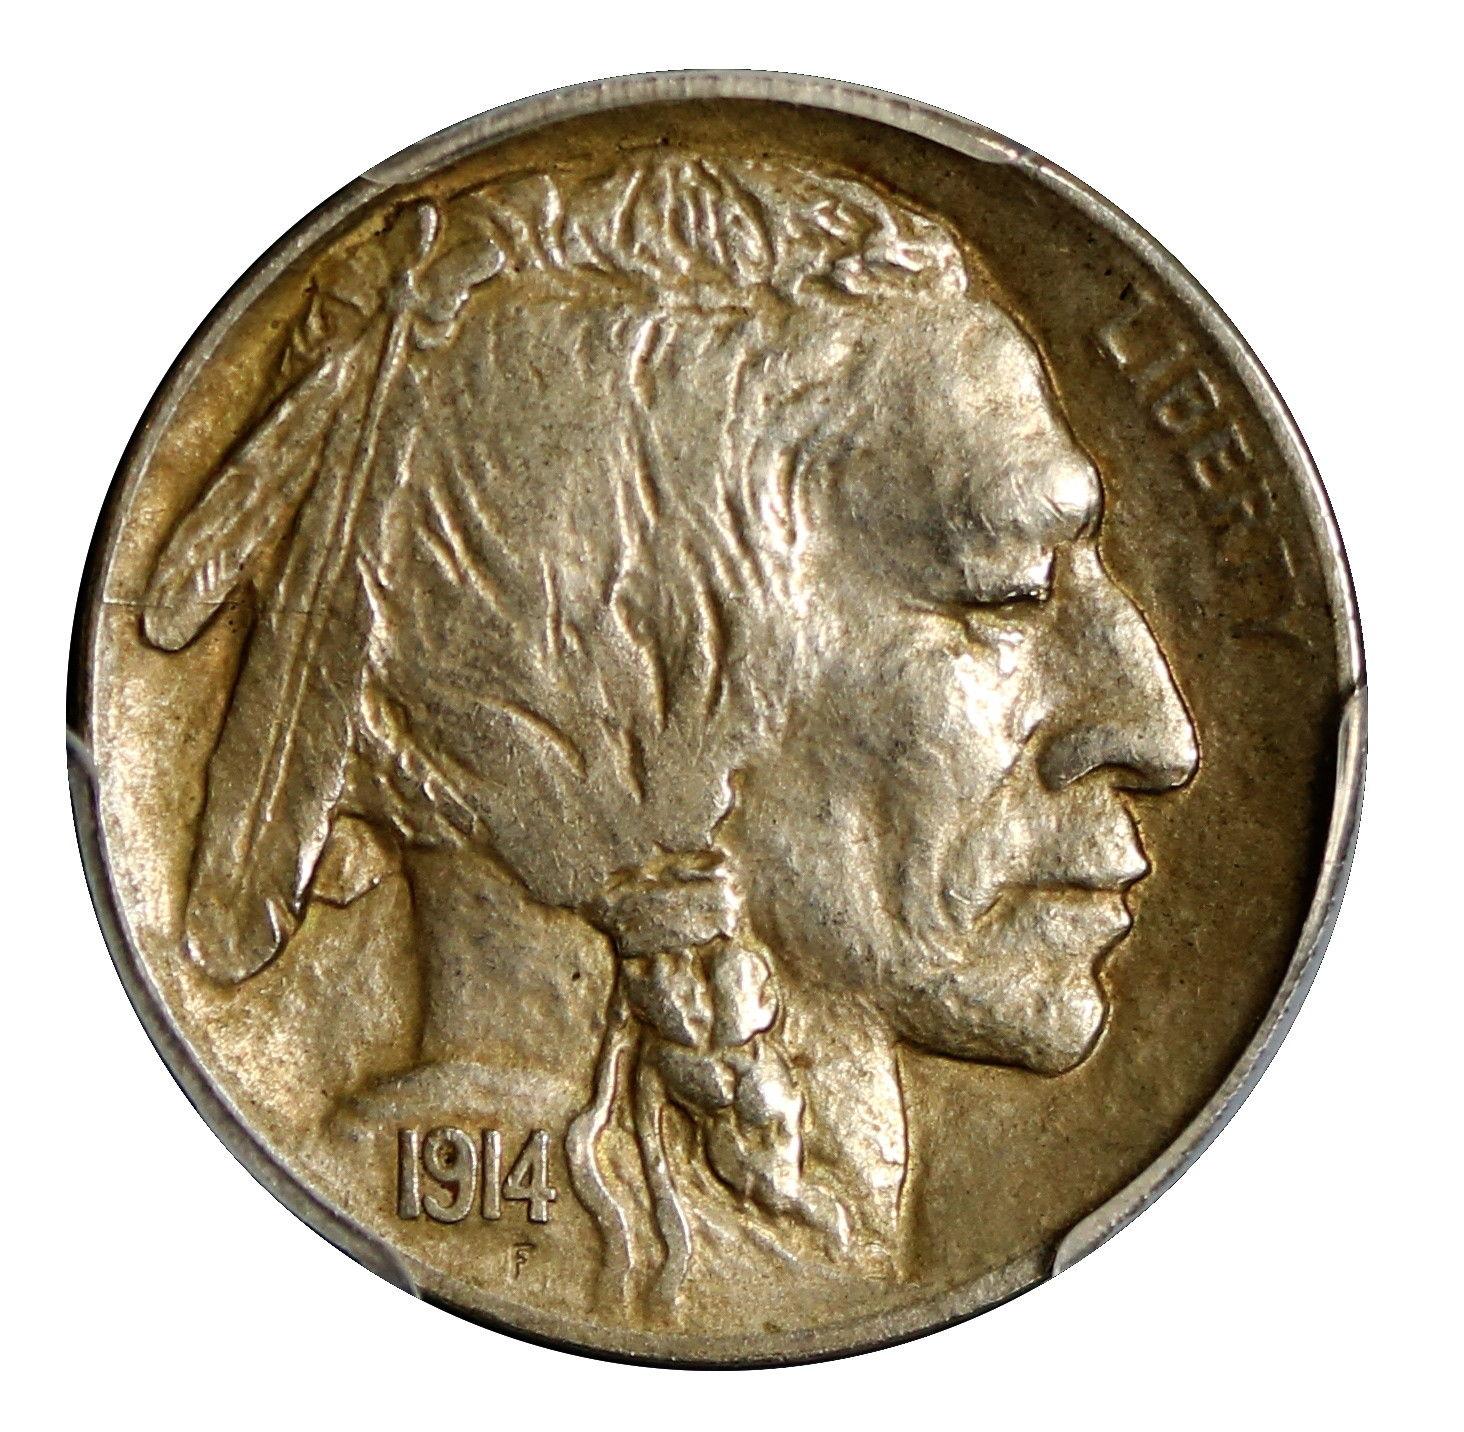 1914-D Buffalo Nickel Graded PCGS AU50